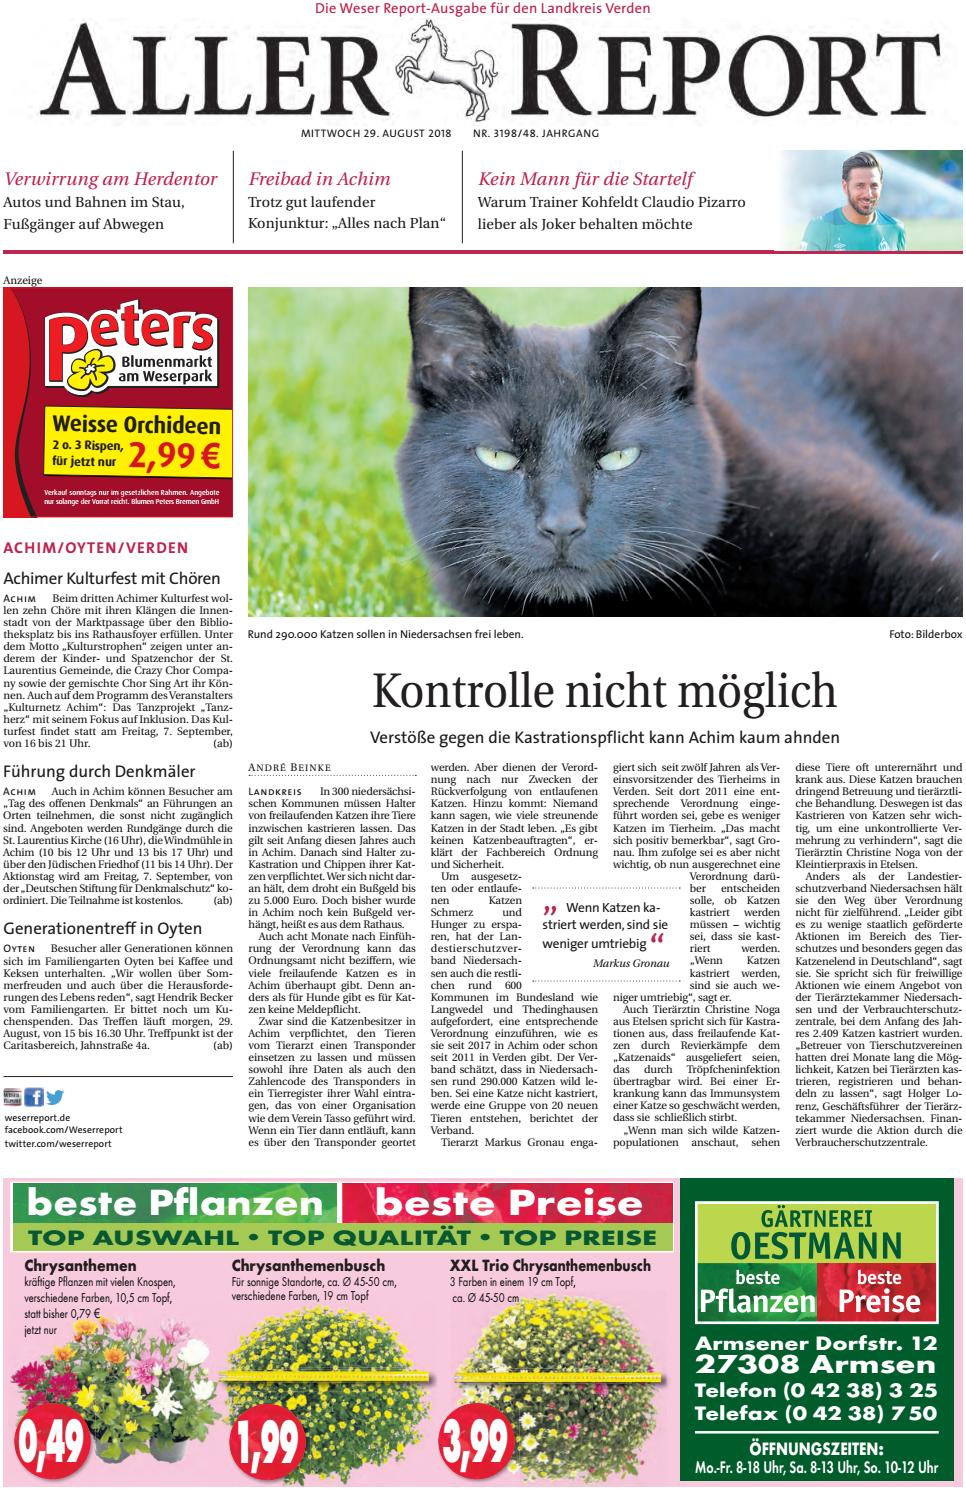 Aller Report vom 29.08.2018 by KPS Verlagsgesellschaft mbH - issuu